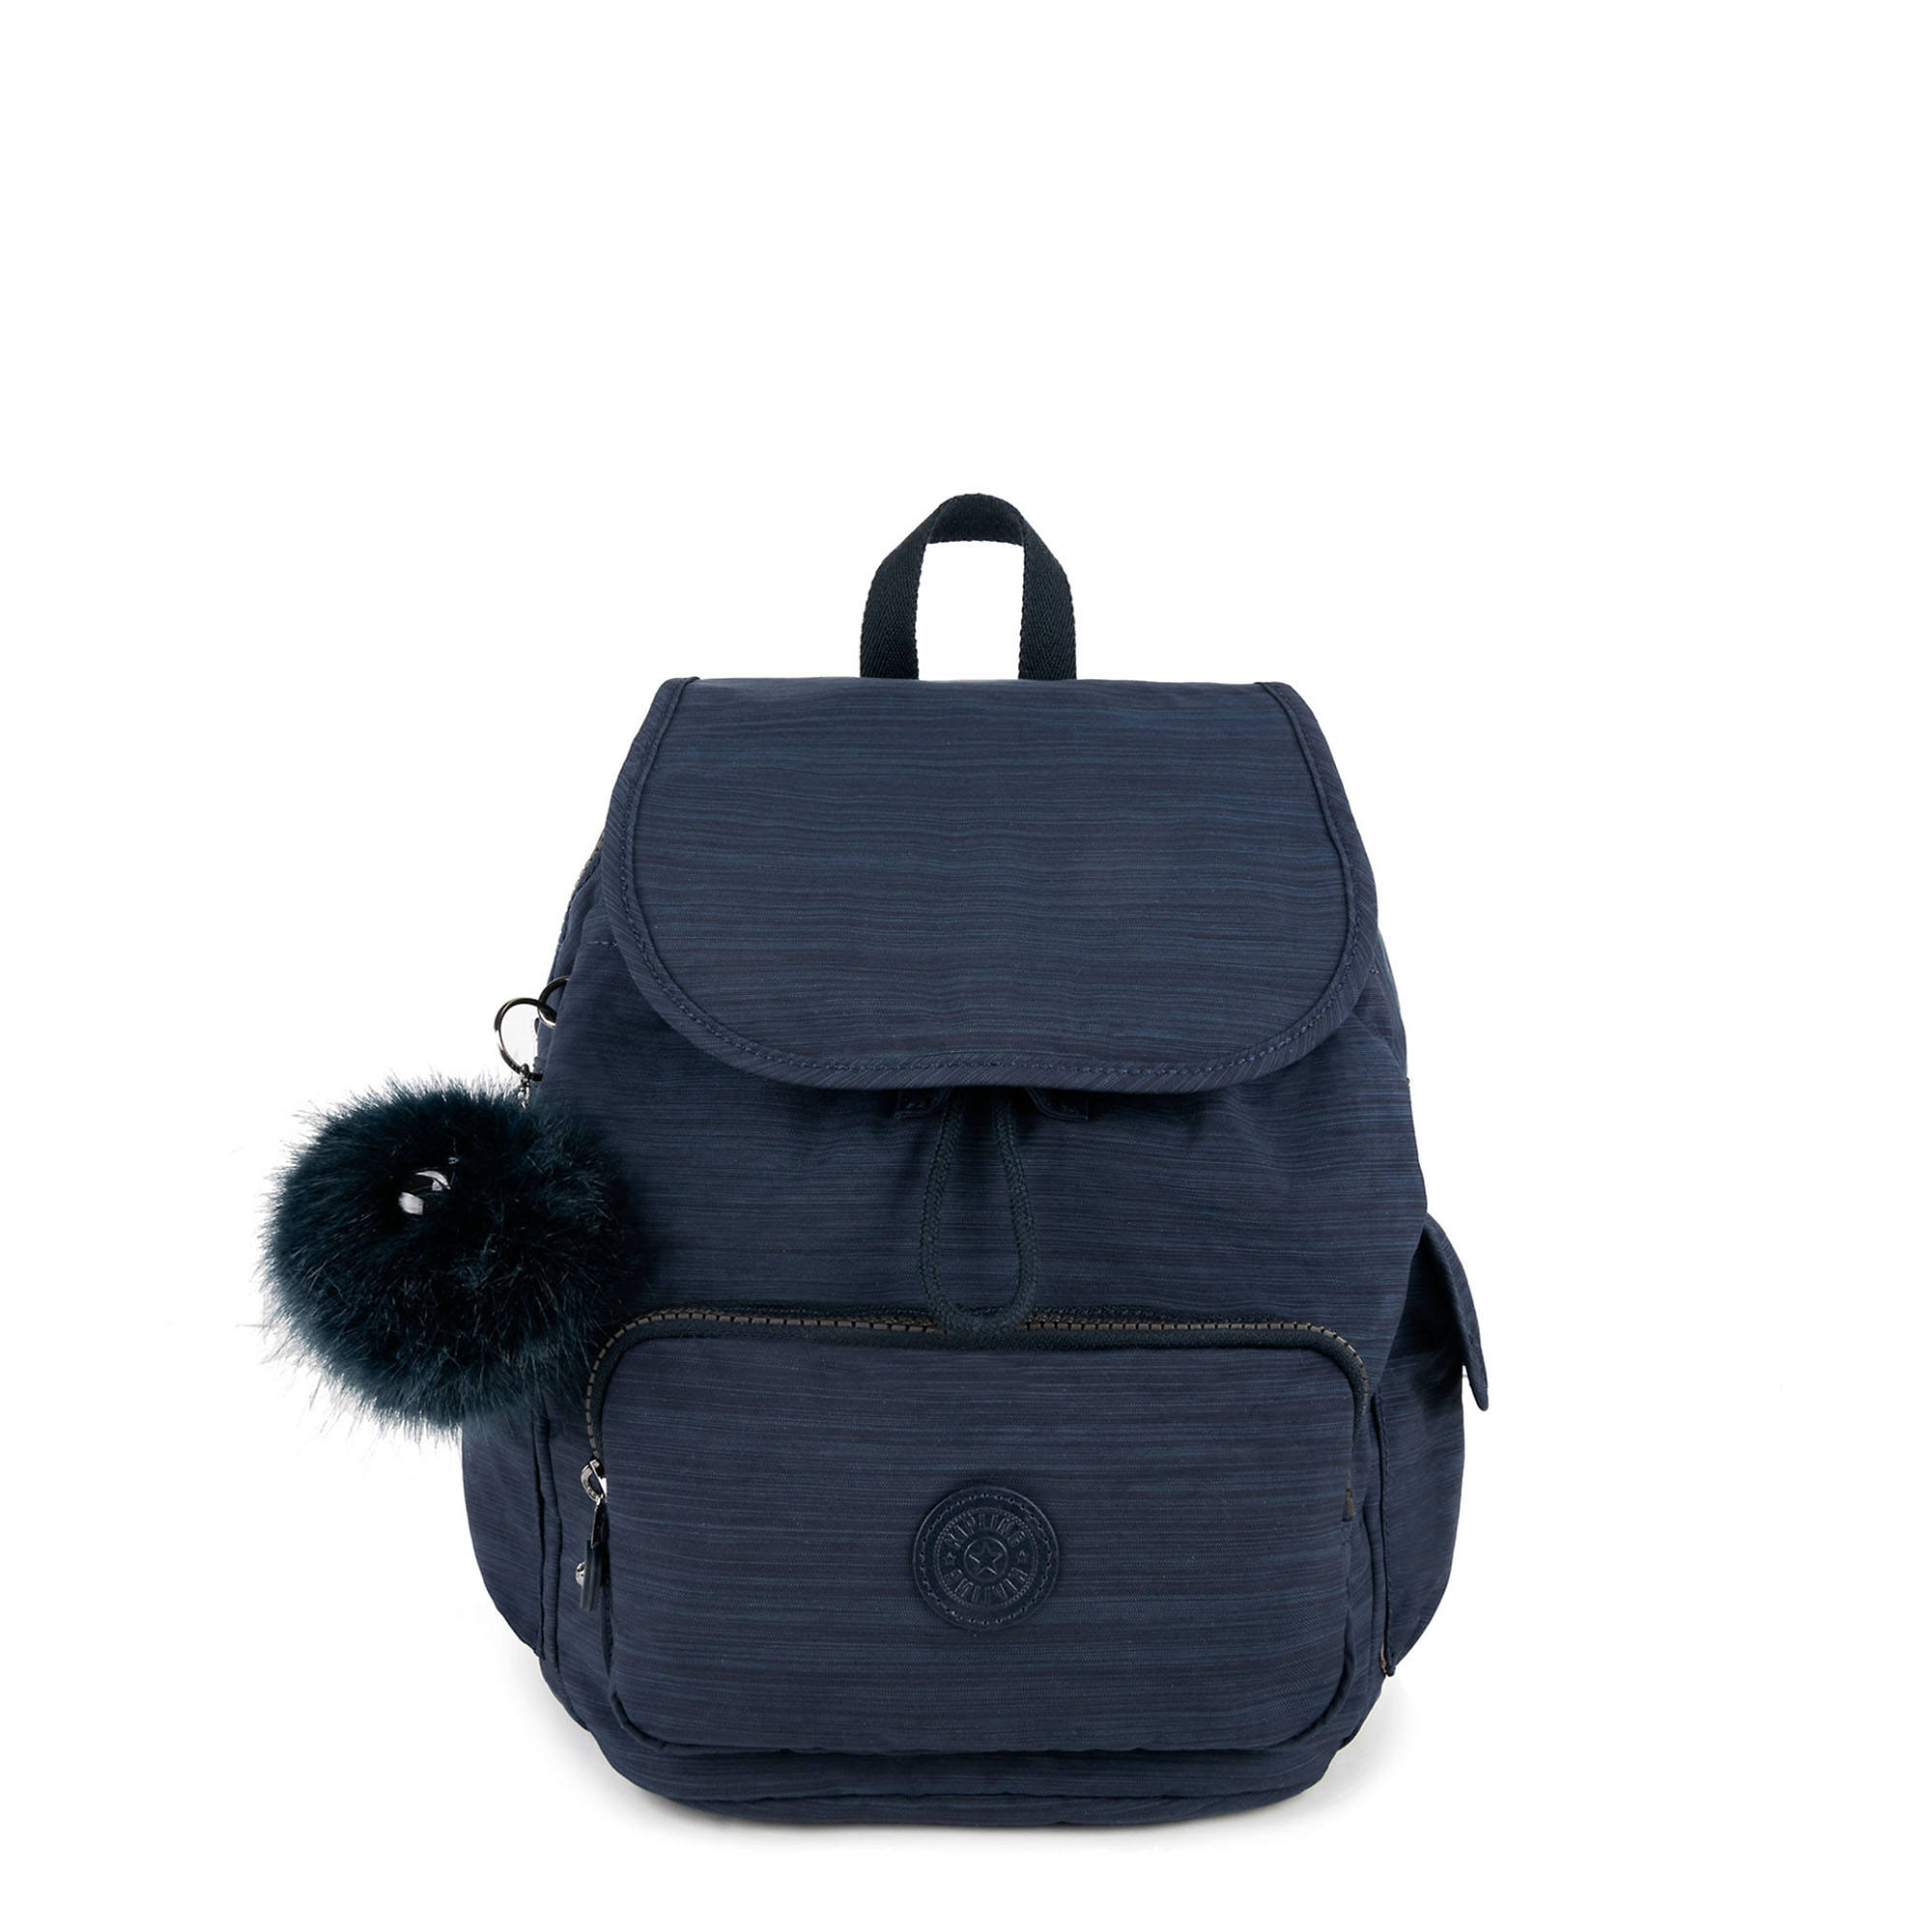 7ee81e83afe Details about Kipling City Pack Small Backpack